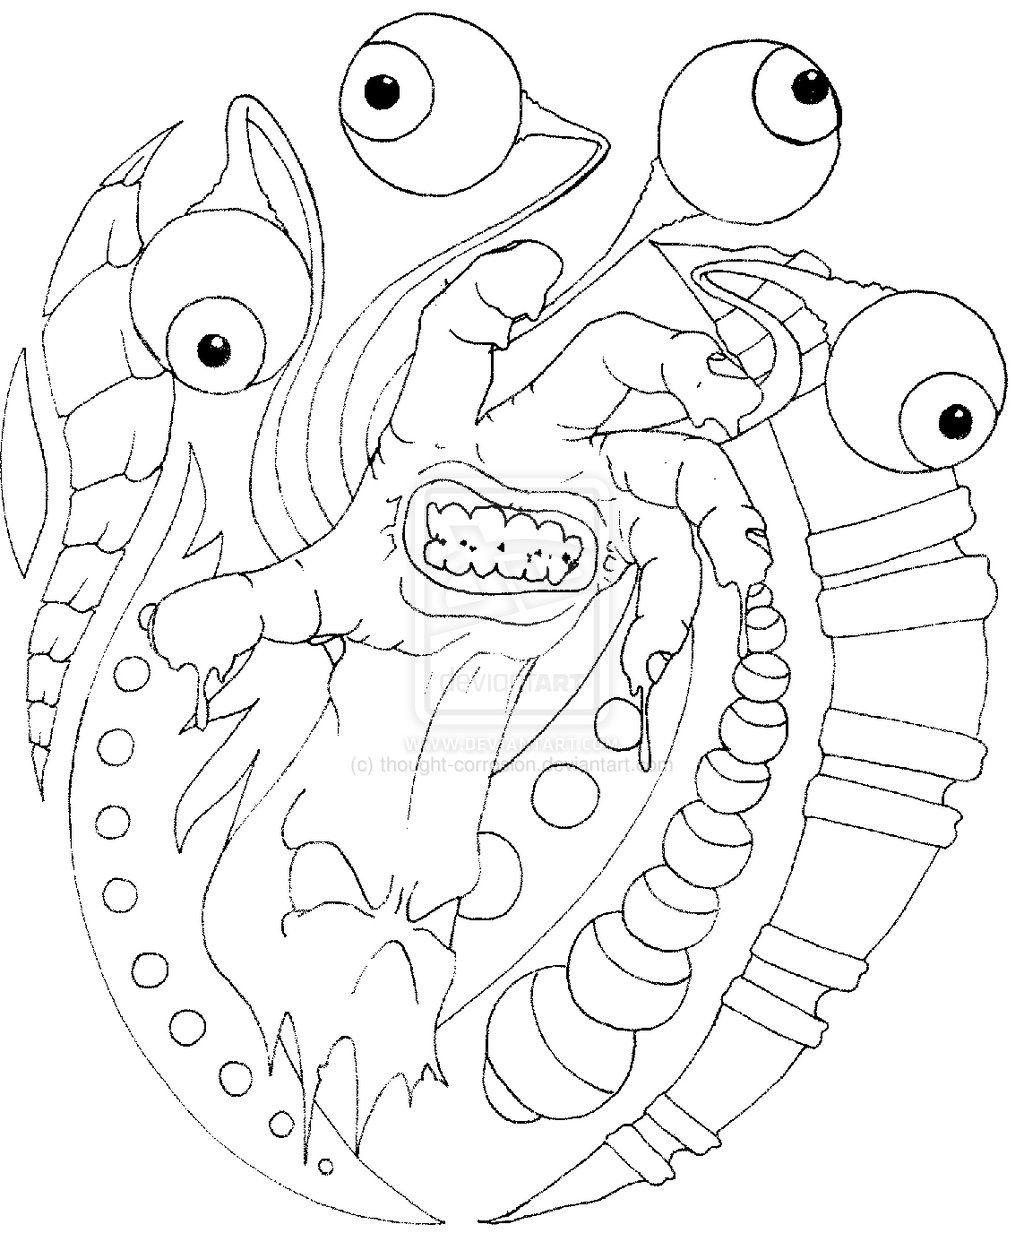 Pin Van Kaylith Macdonald Op Drawings Kleurplaten